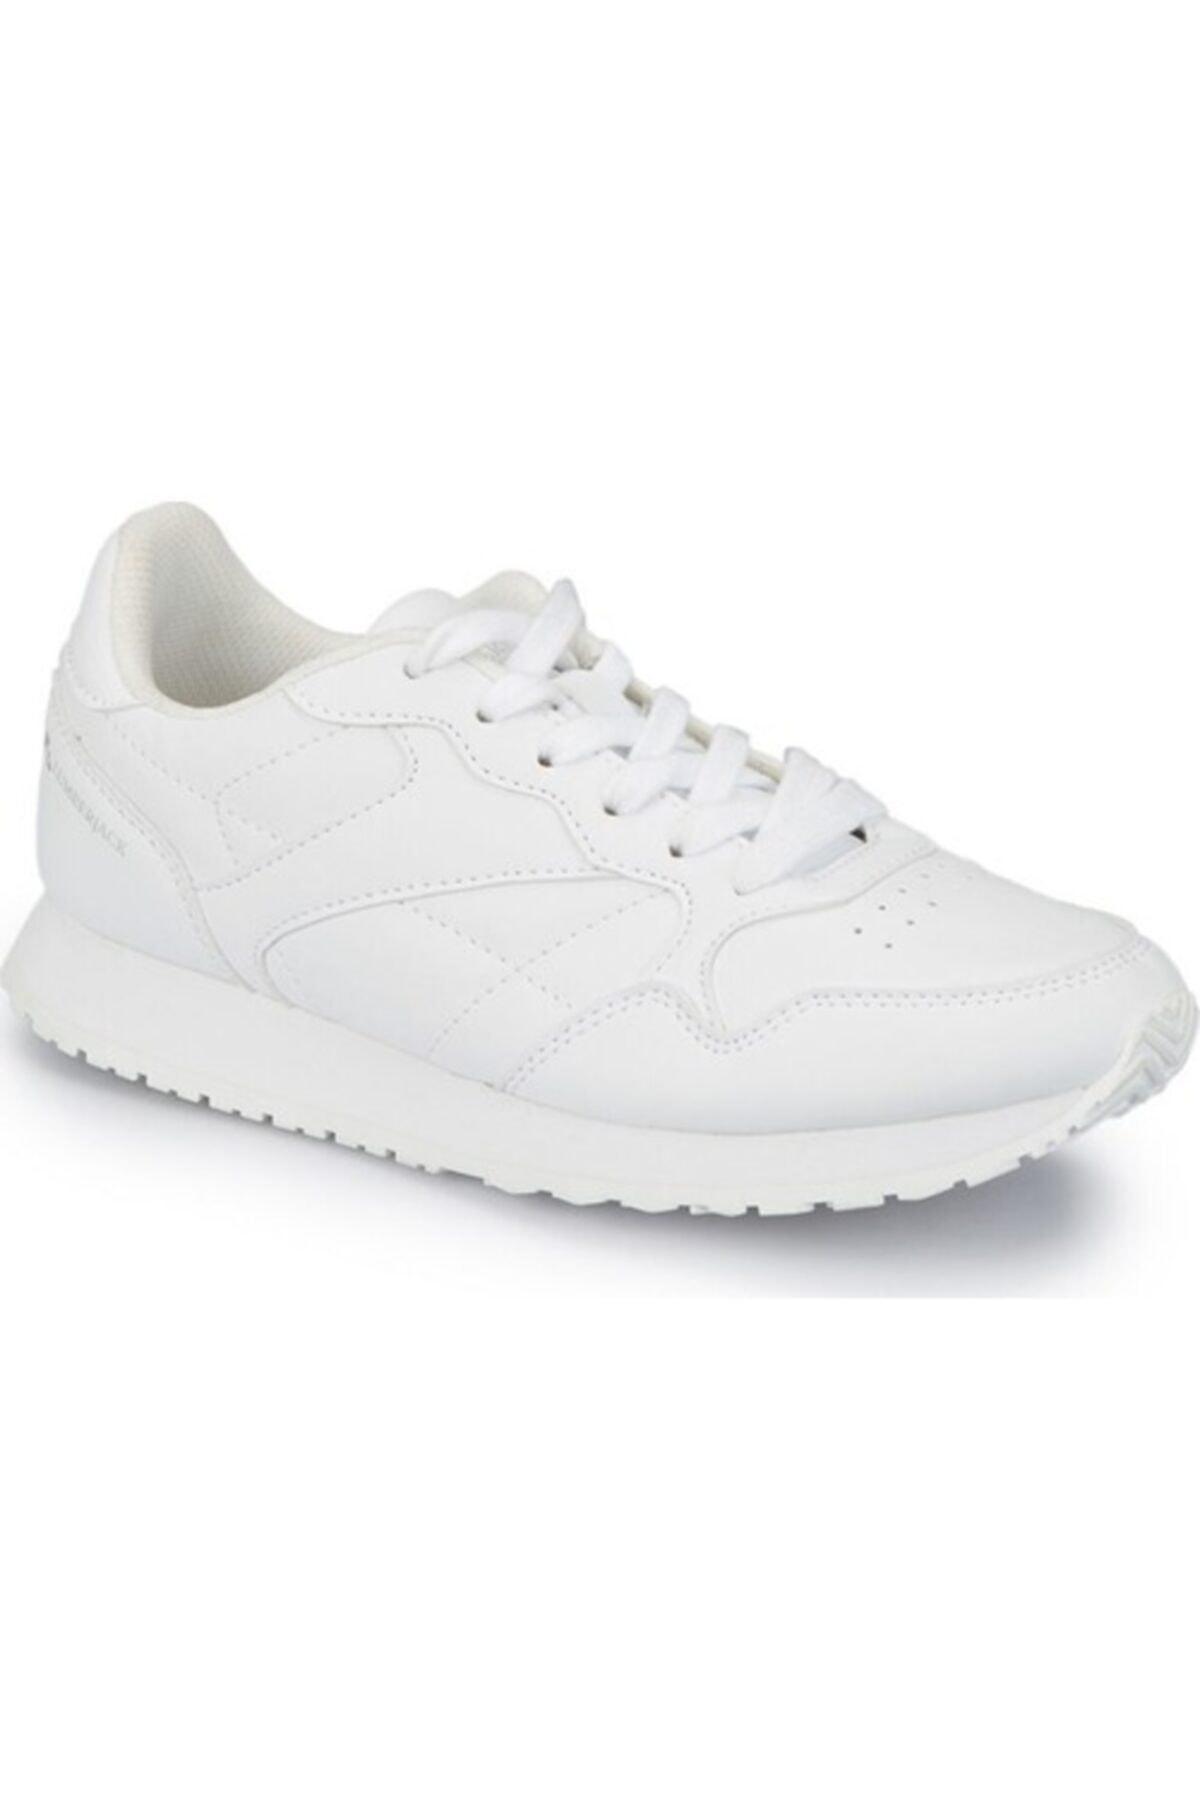 lumberjack HELLO WMN Beyaz Kadın Sneaker 100298984 2